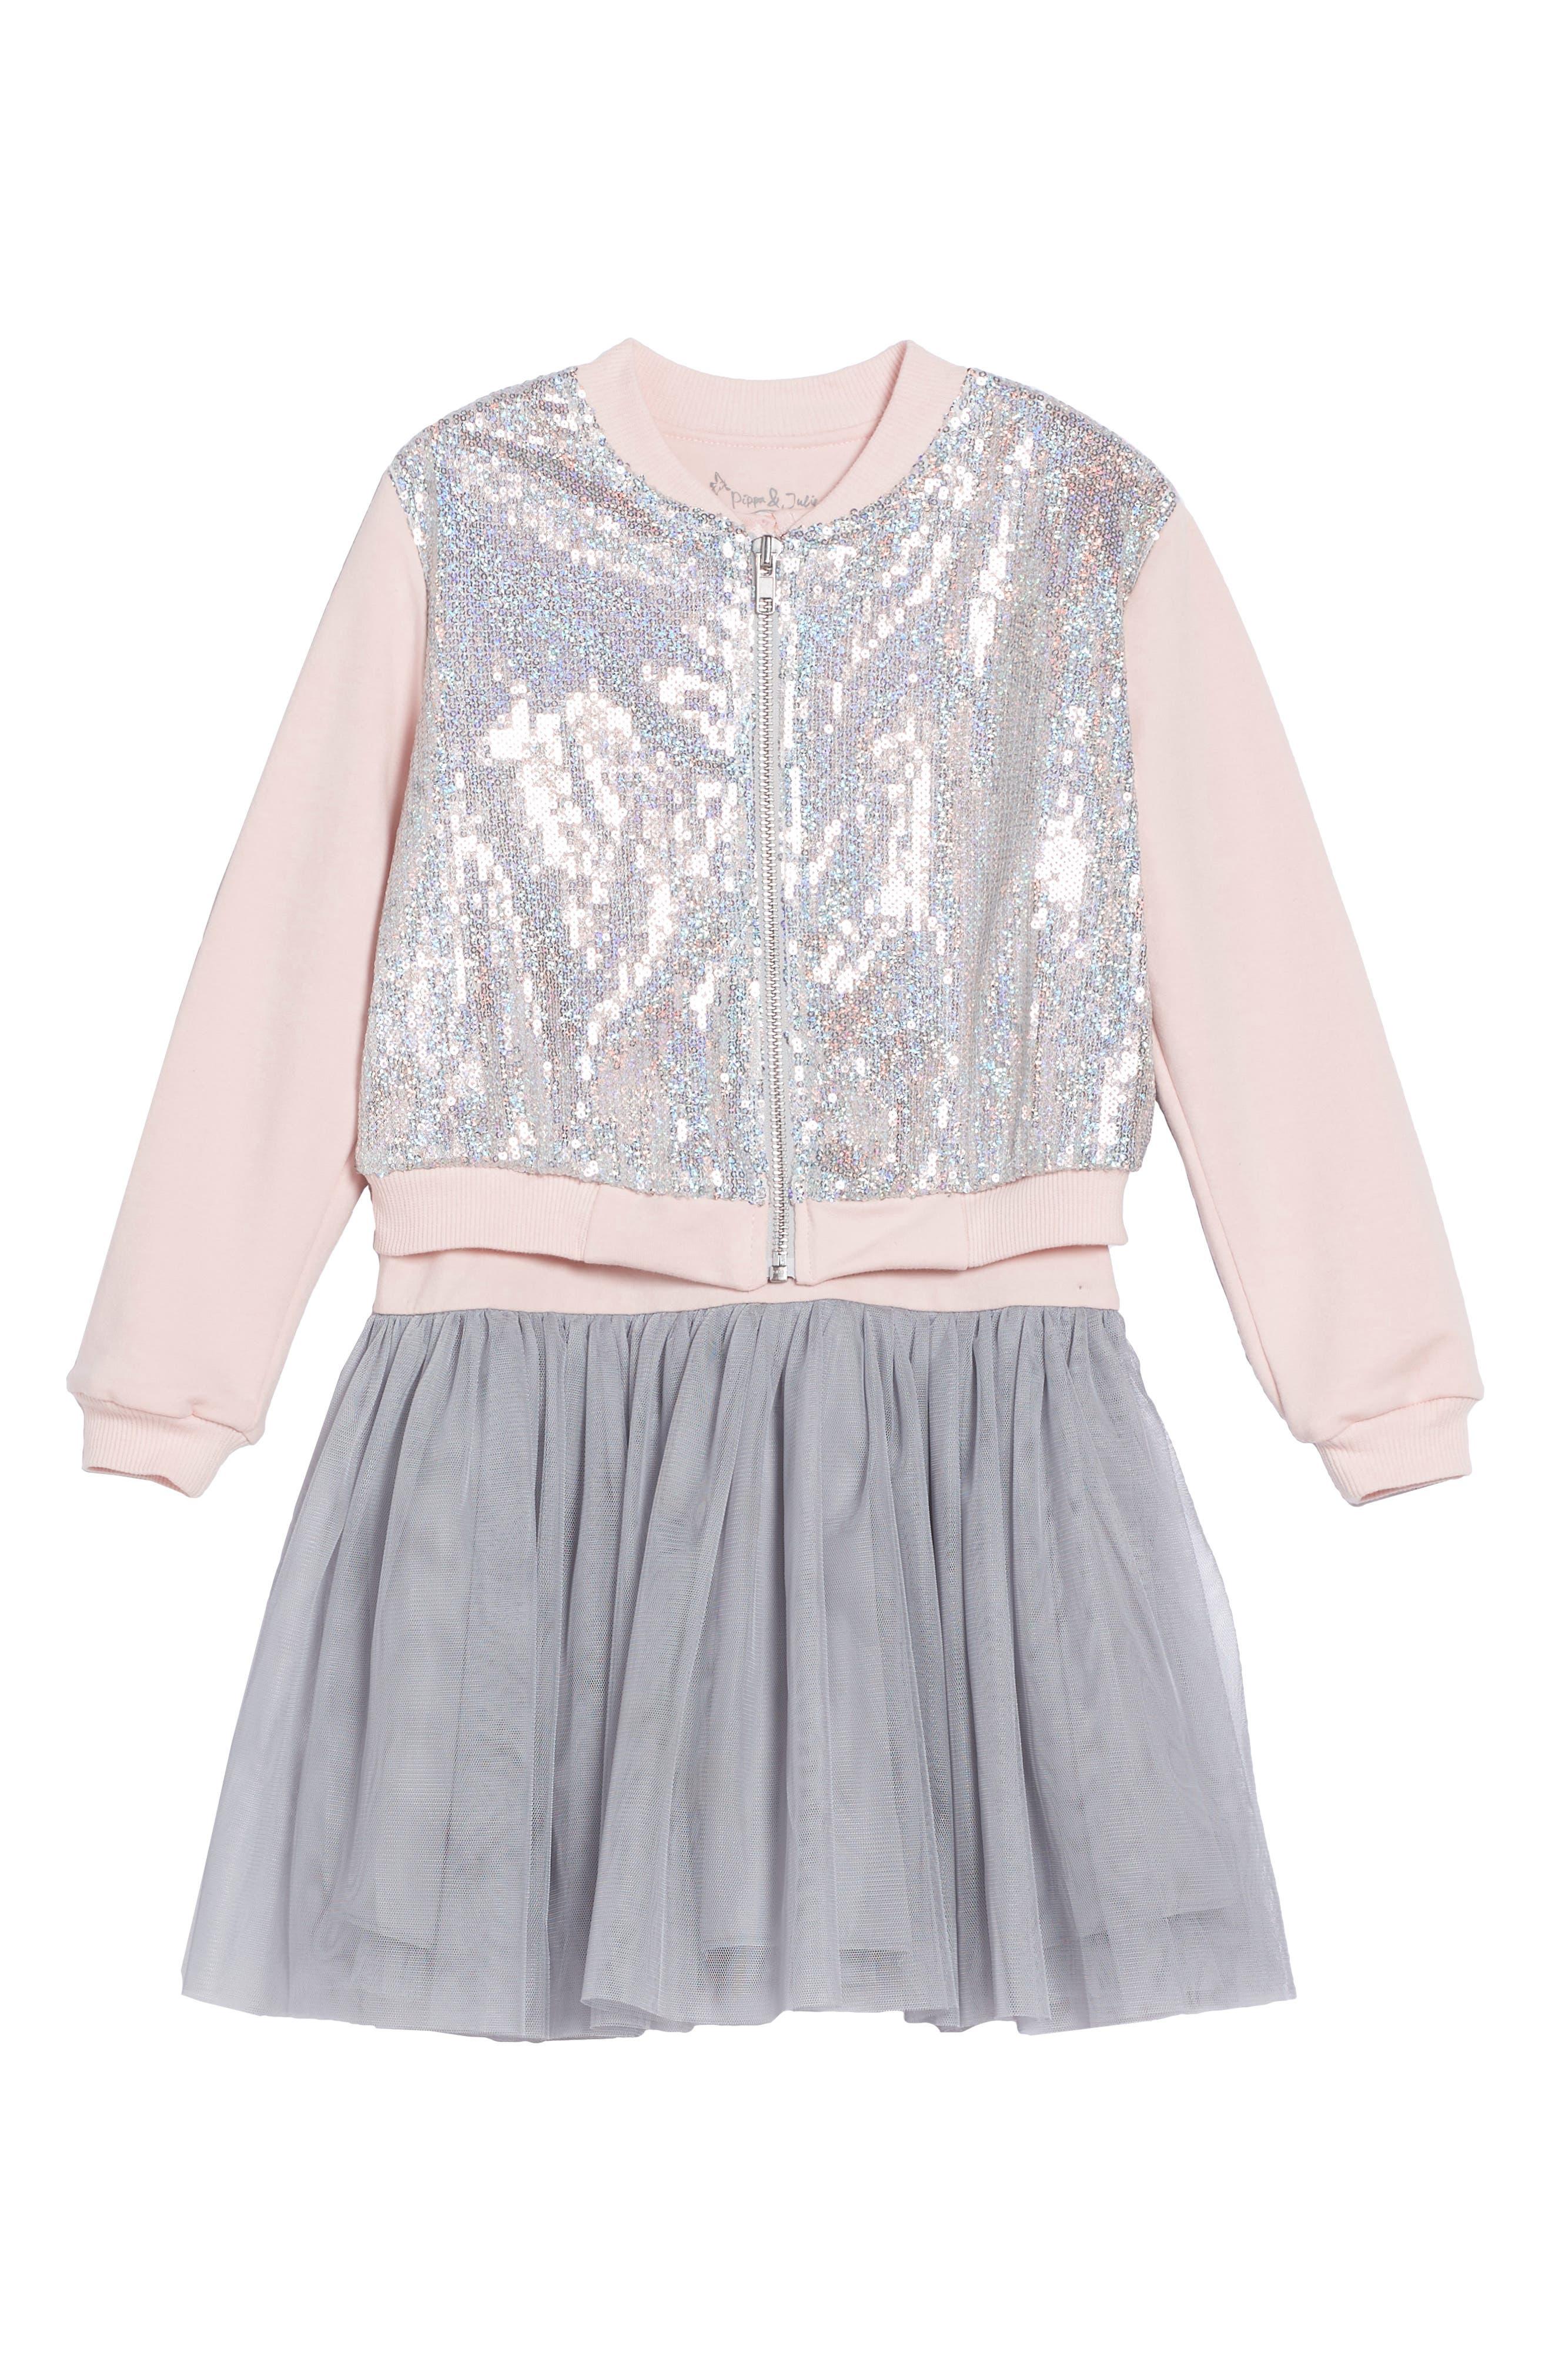 Pippa & Julie Tank Dress & Sequin Bomber Jacket Set (Toddler Girls, Little Girls & Big Girls)